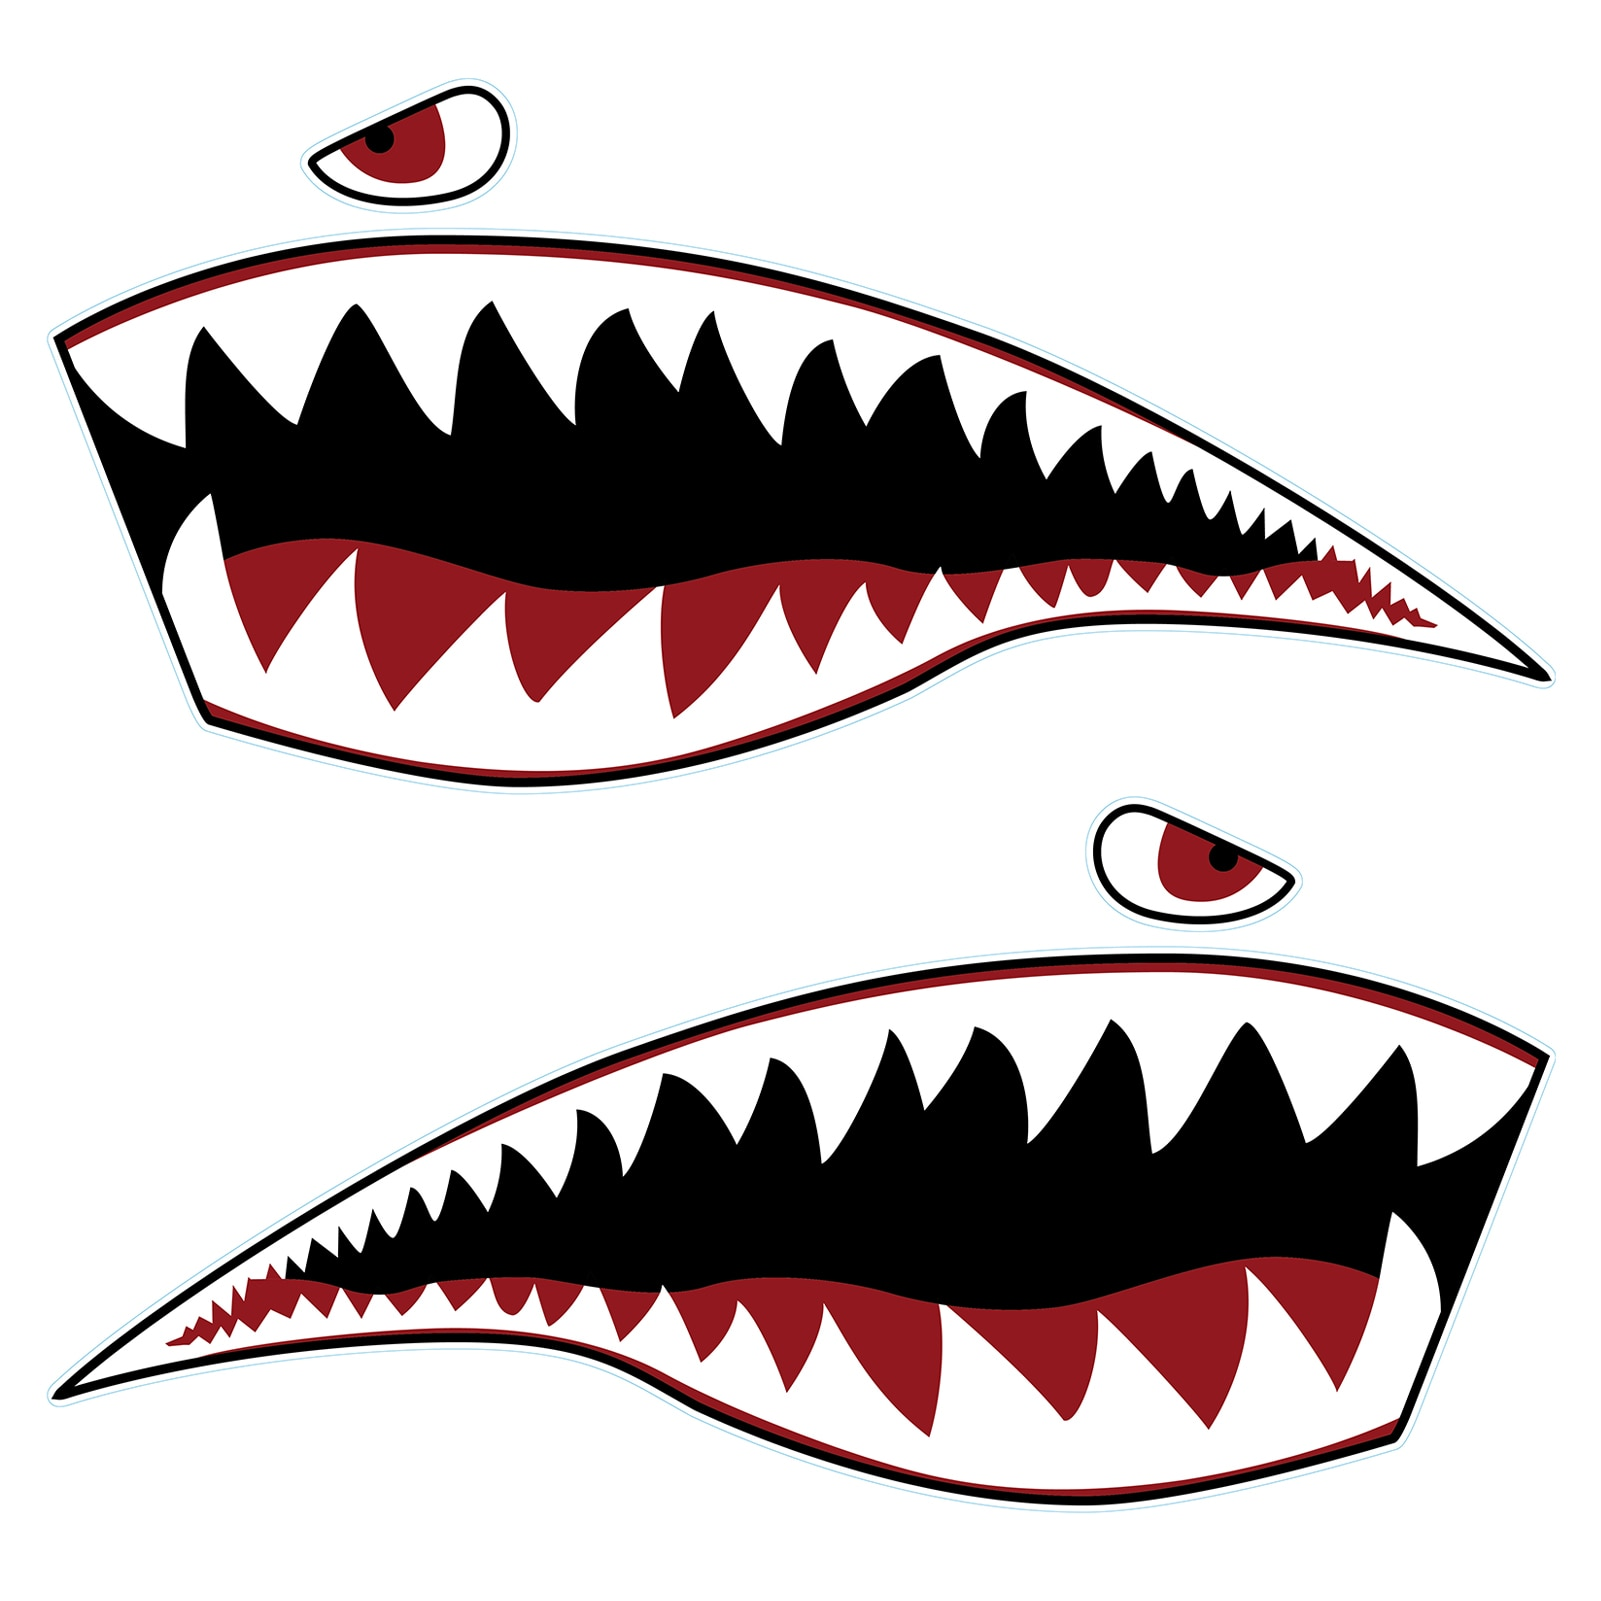 2PC Kayak Sticker Waterproof Canoe Shark Teeth Mouth Stickers Decals Apply To Canoe Dinghy Marine Boat Car Truck